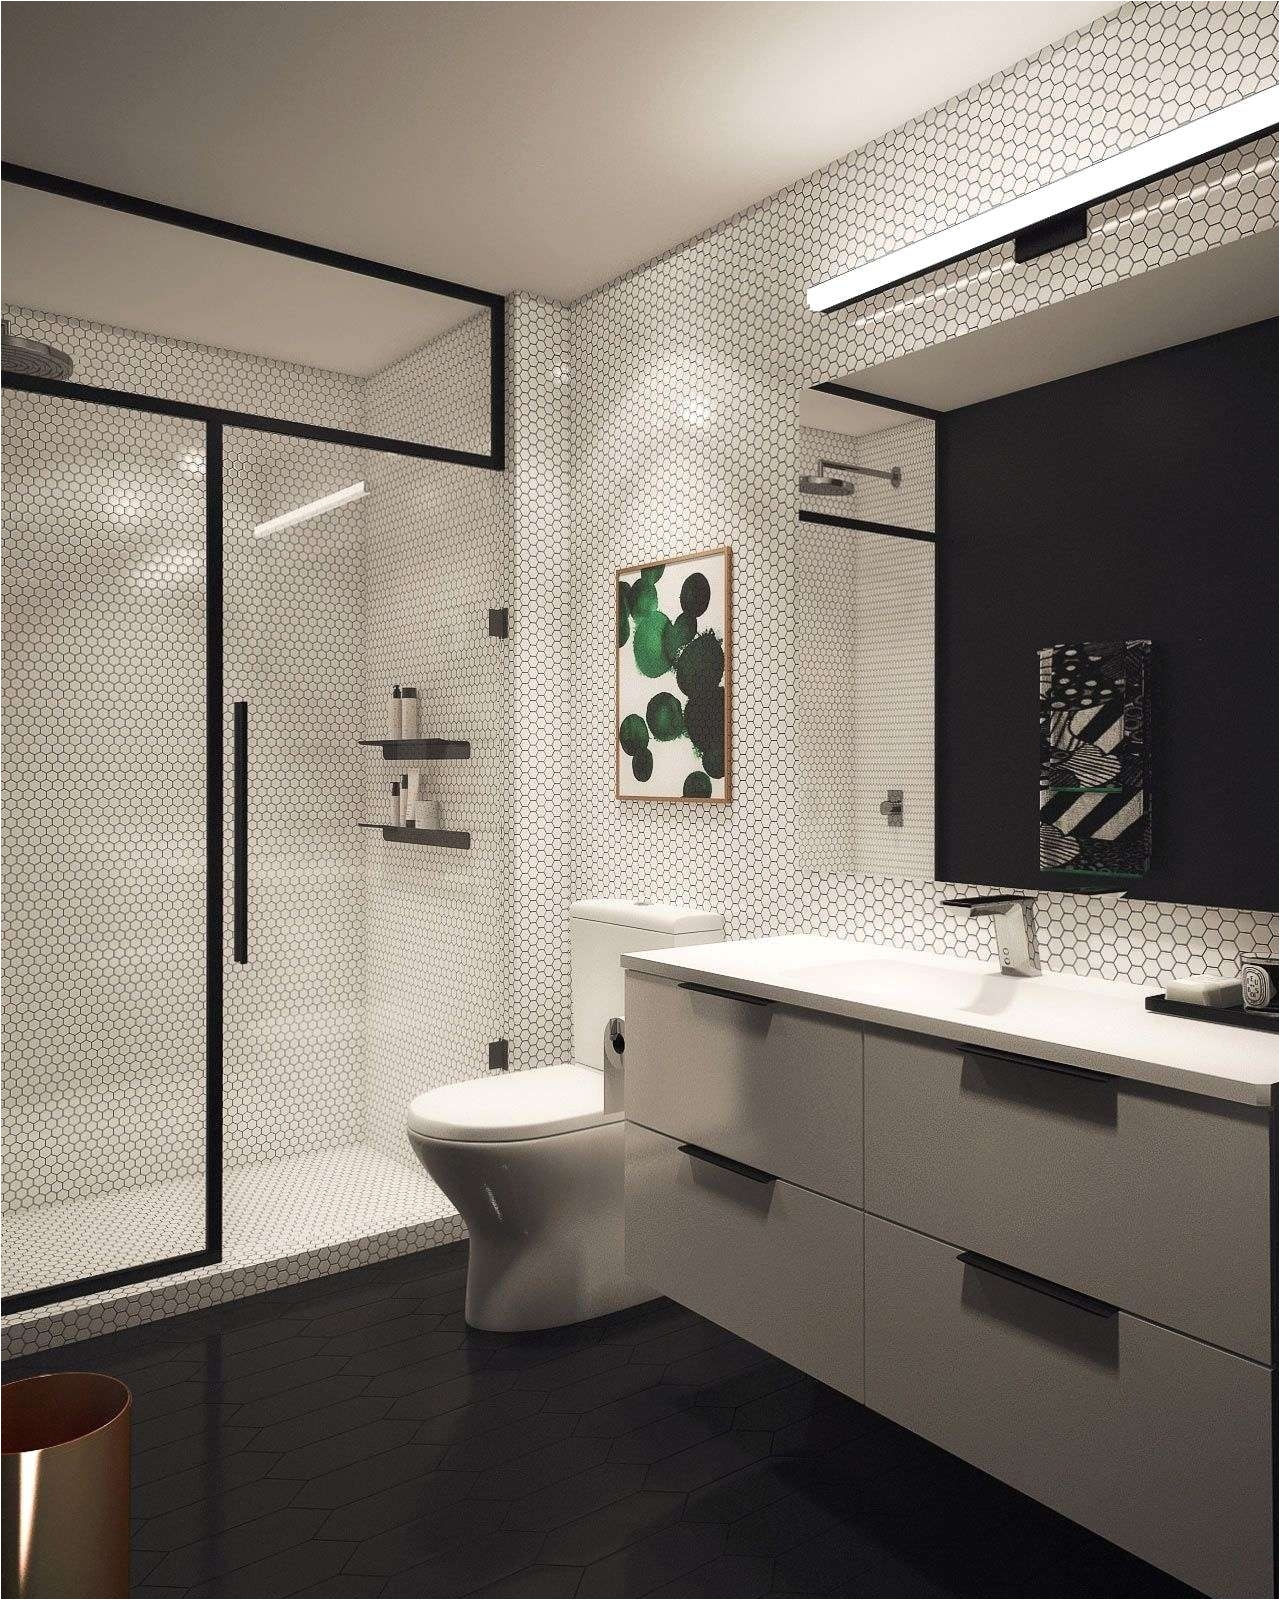 Bathroom Design Ideas Pictures Bathroom Design Ideas for Small Bathrooms Valid Lovely Small